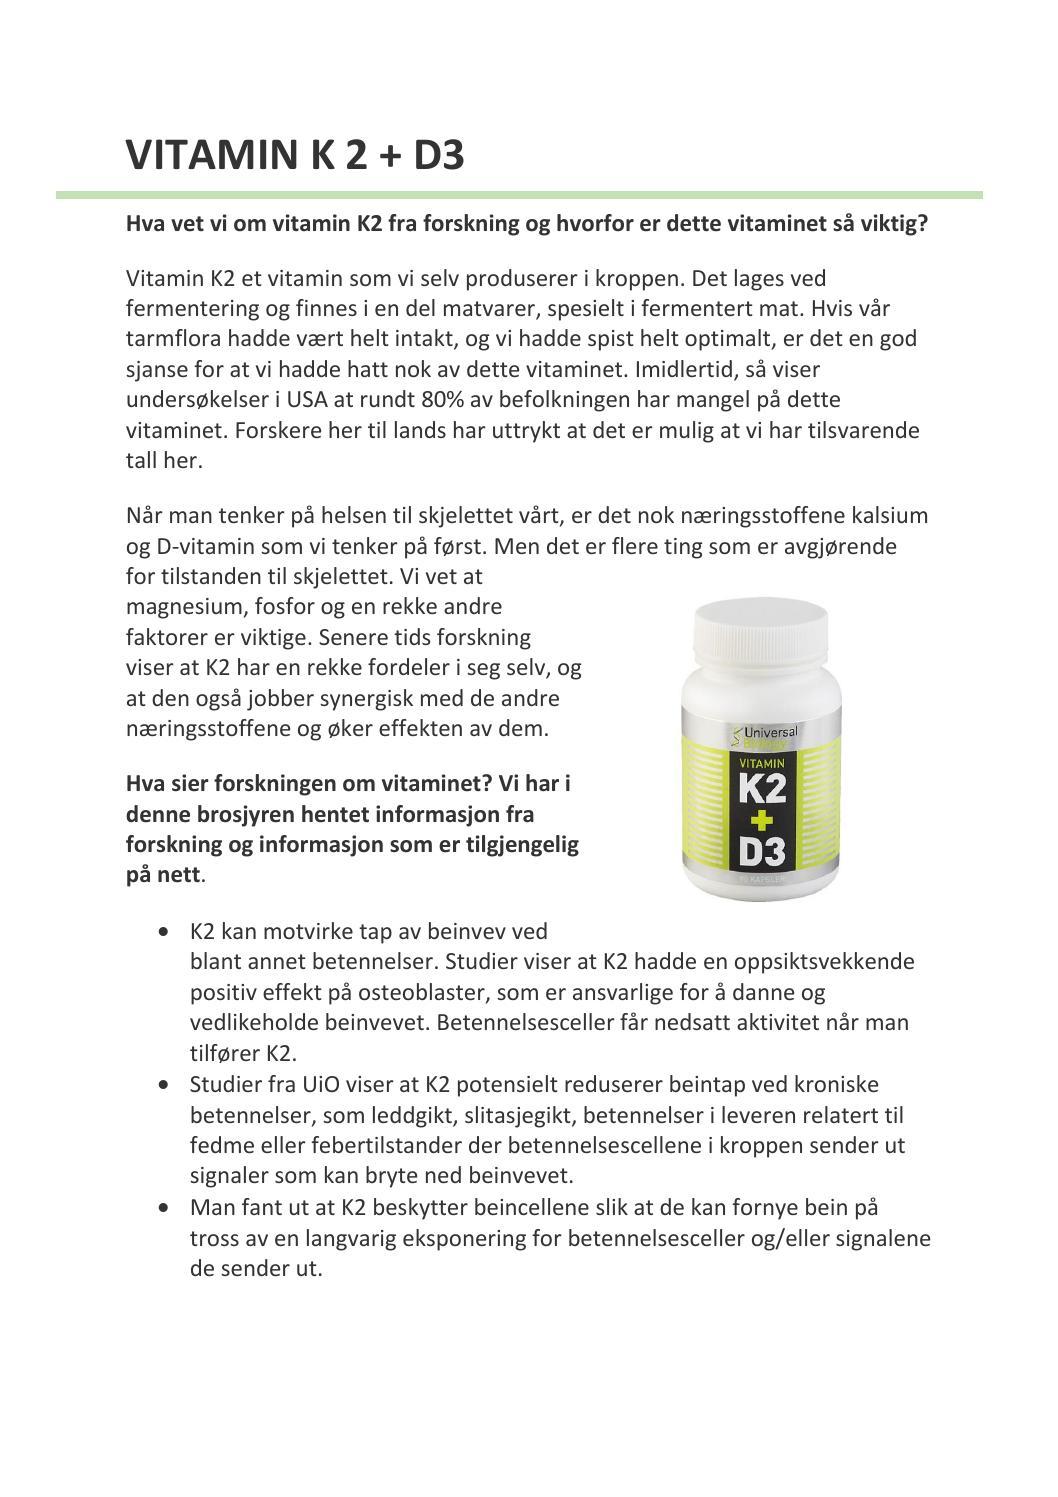 k2 vitamin forskning